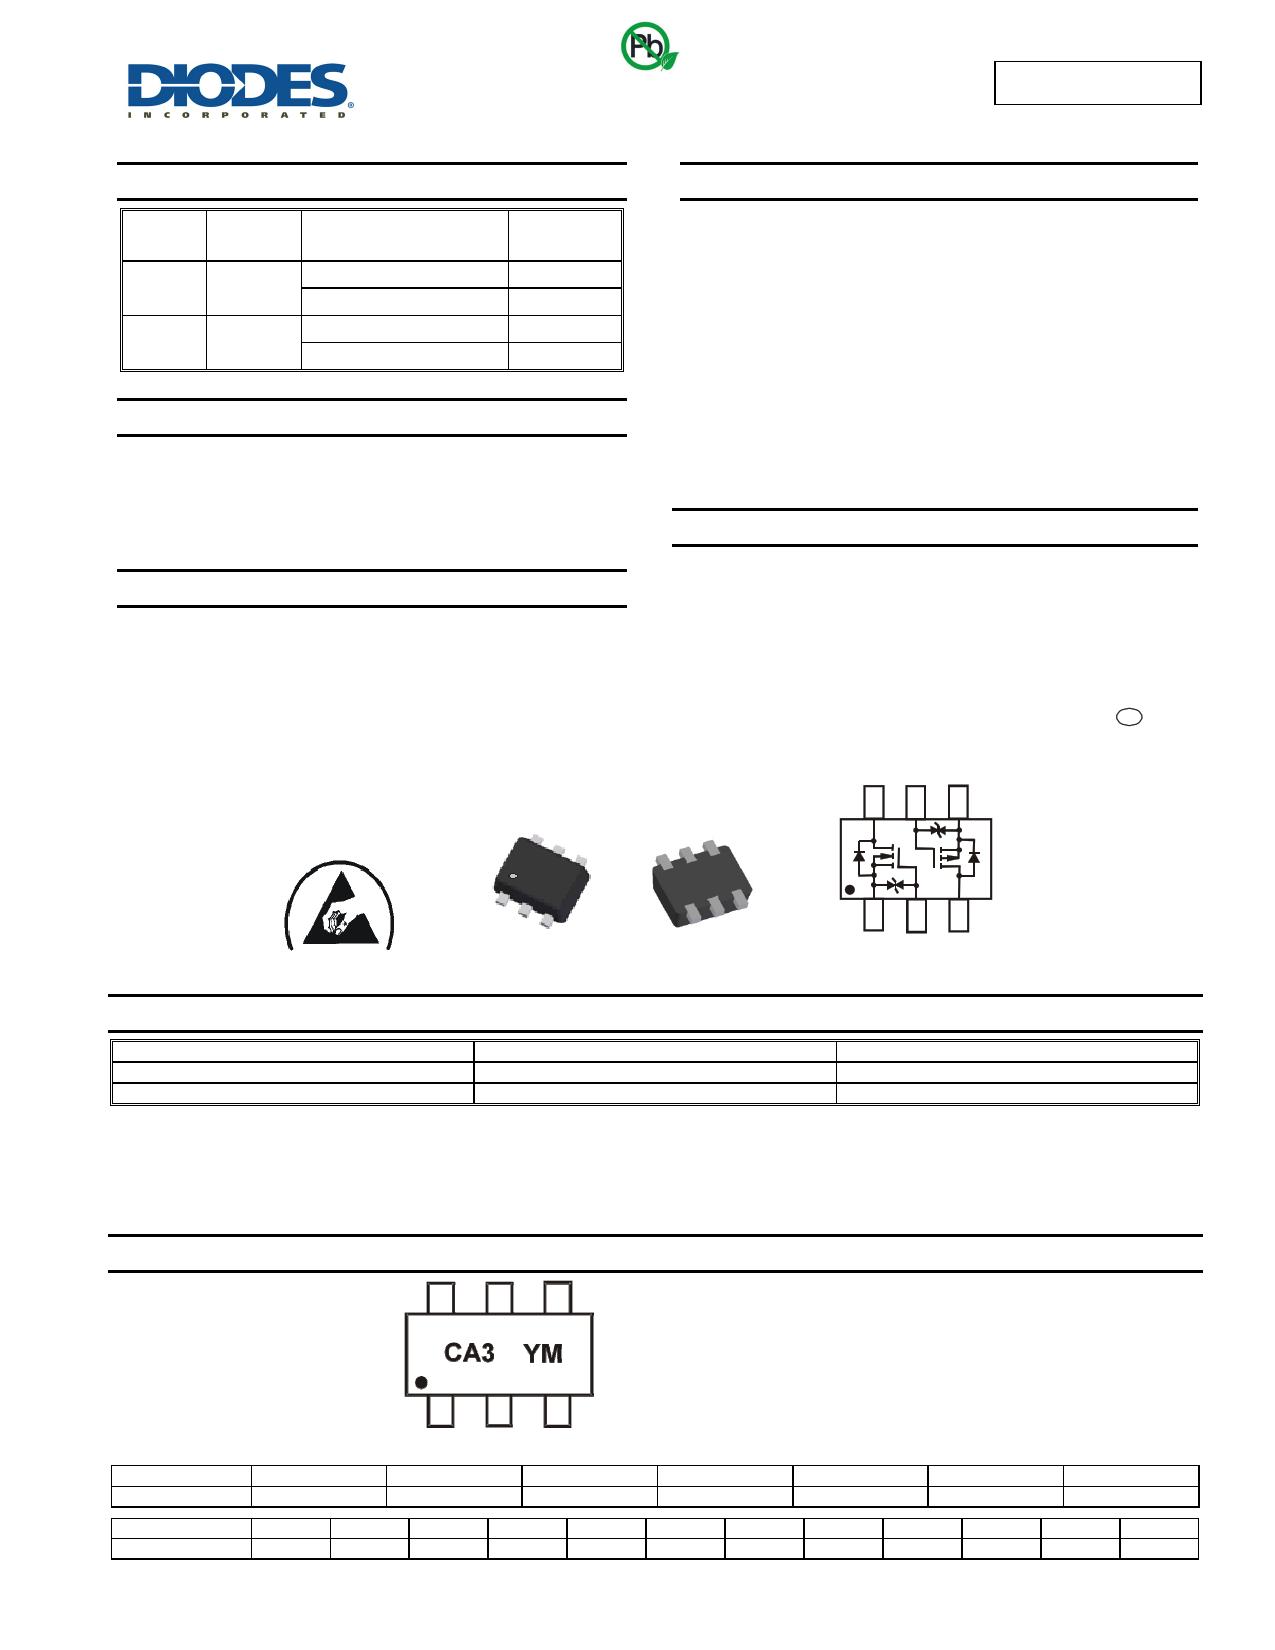 DMC2400UV datasheet